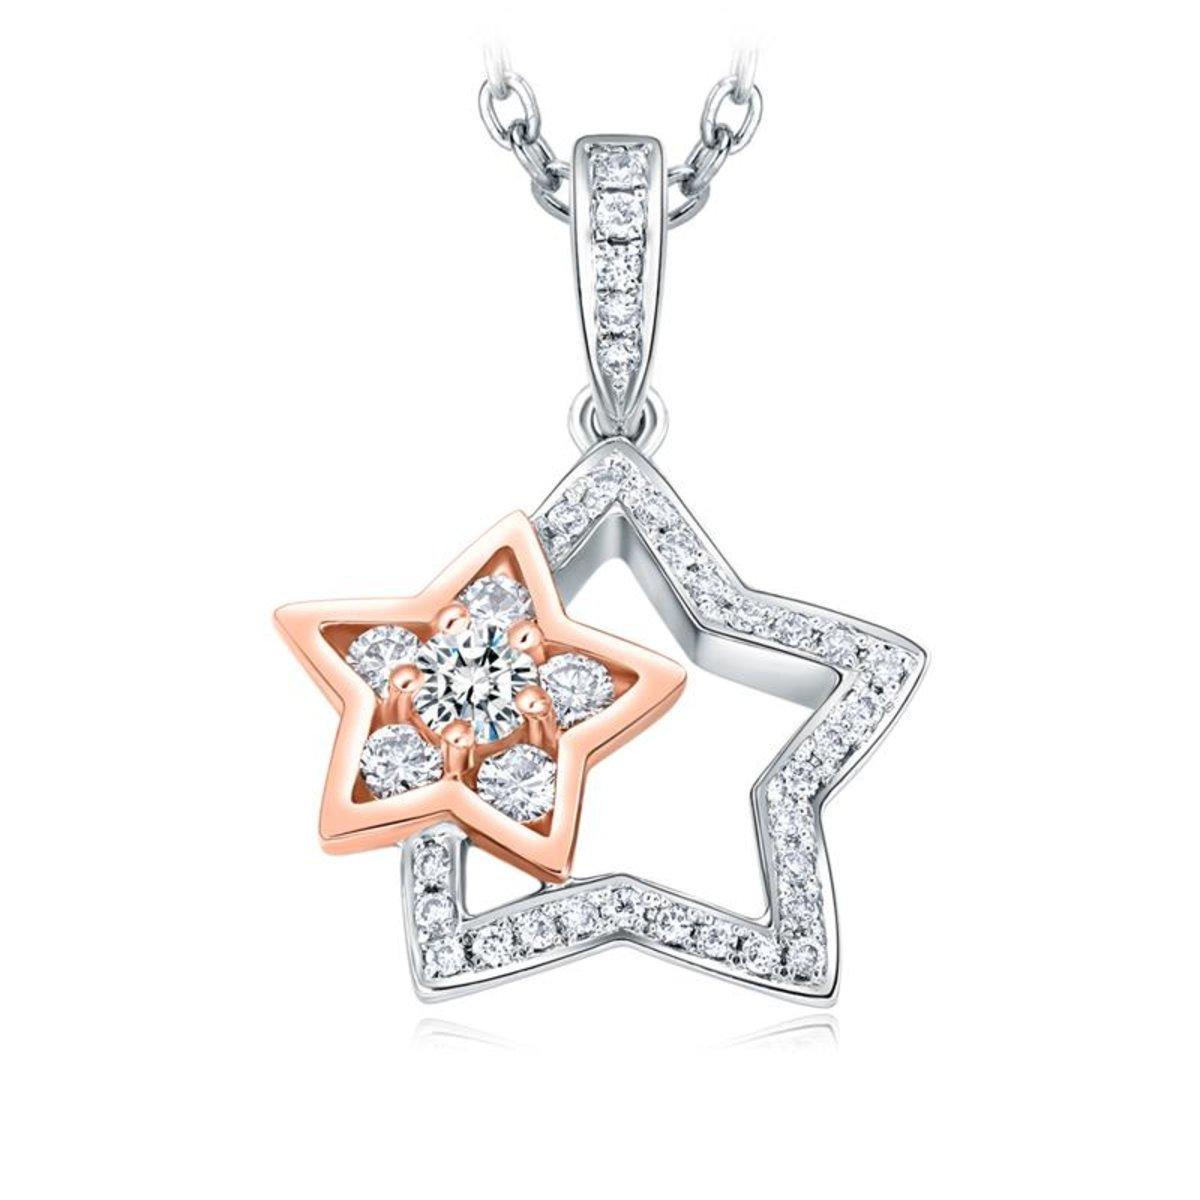 18K/ 750 Rose, White Gold diamond pendant